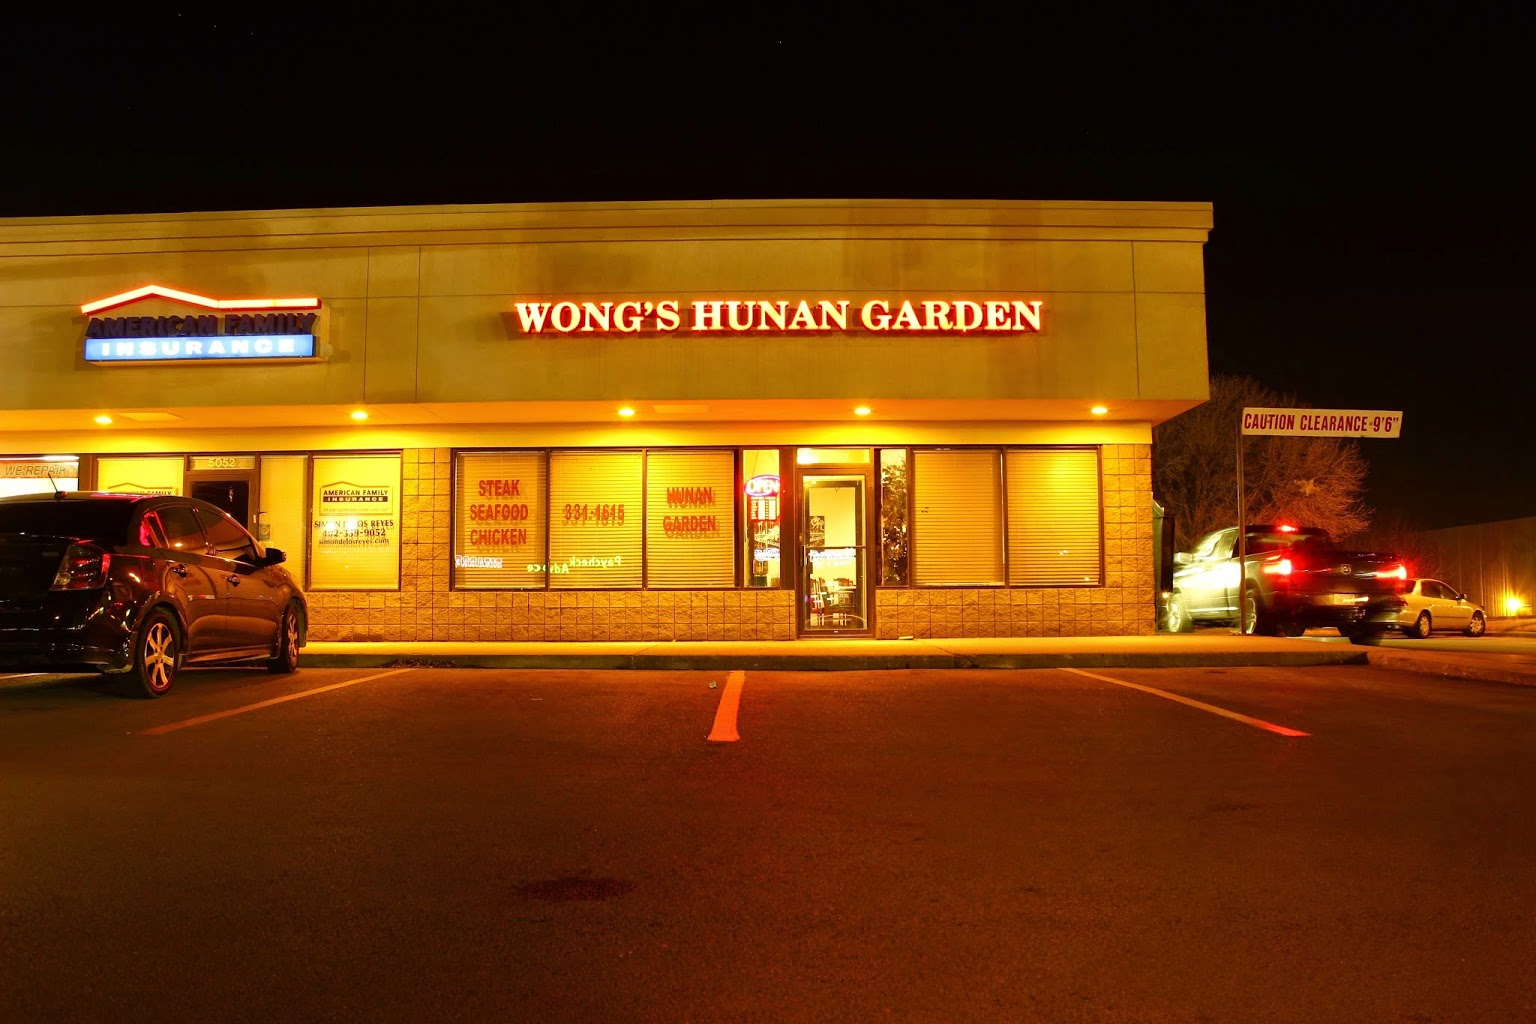 Wong\'s Hunan Garden 5050 S 108th St, Omaha, NE 68137 - YP.com